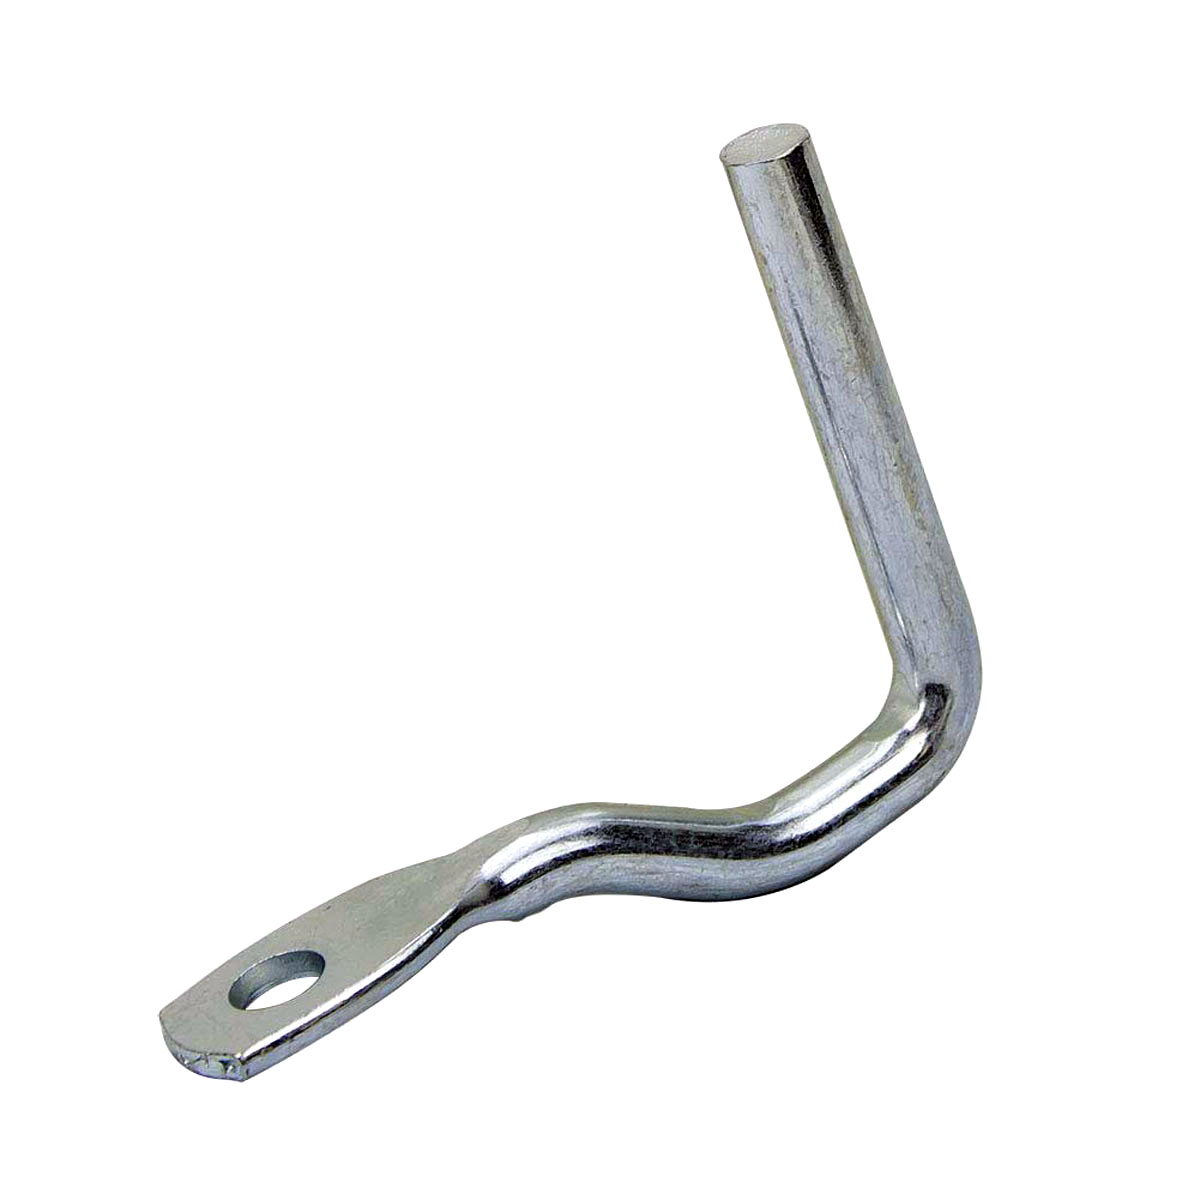 Craftsman Bench Grinder Wiring Diagram also 532198468 Husqvarna KEEPER BELT IDLER 54T besides Craftsman Cordless Drill Wiring Diagram moreover 128305 3 1 4 Inch Planer Blades For Craftsman 900173700 Hss Set Of 2 together with Belt Sander Switch Wiring Diagram. on 6 inch belt grinder parts